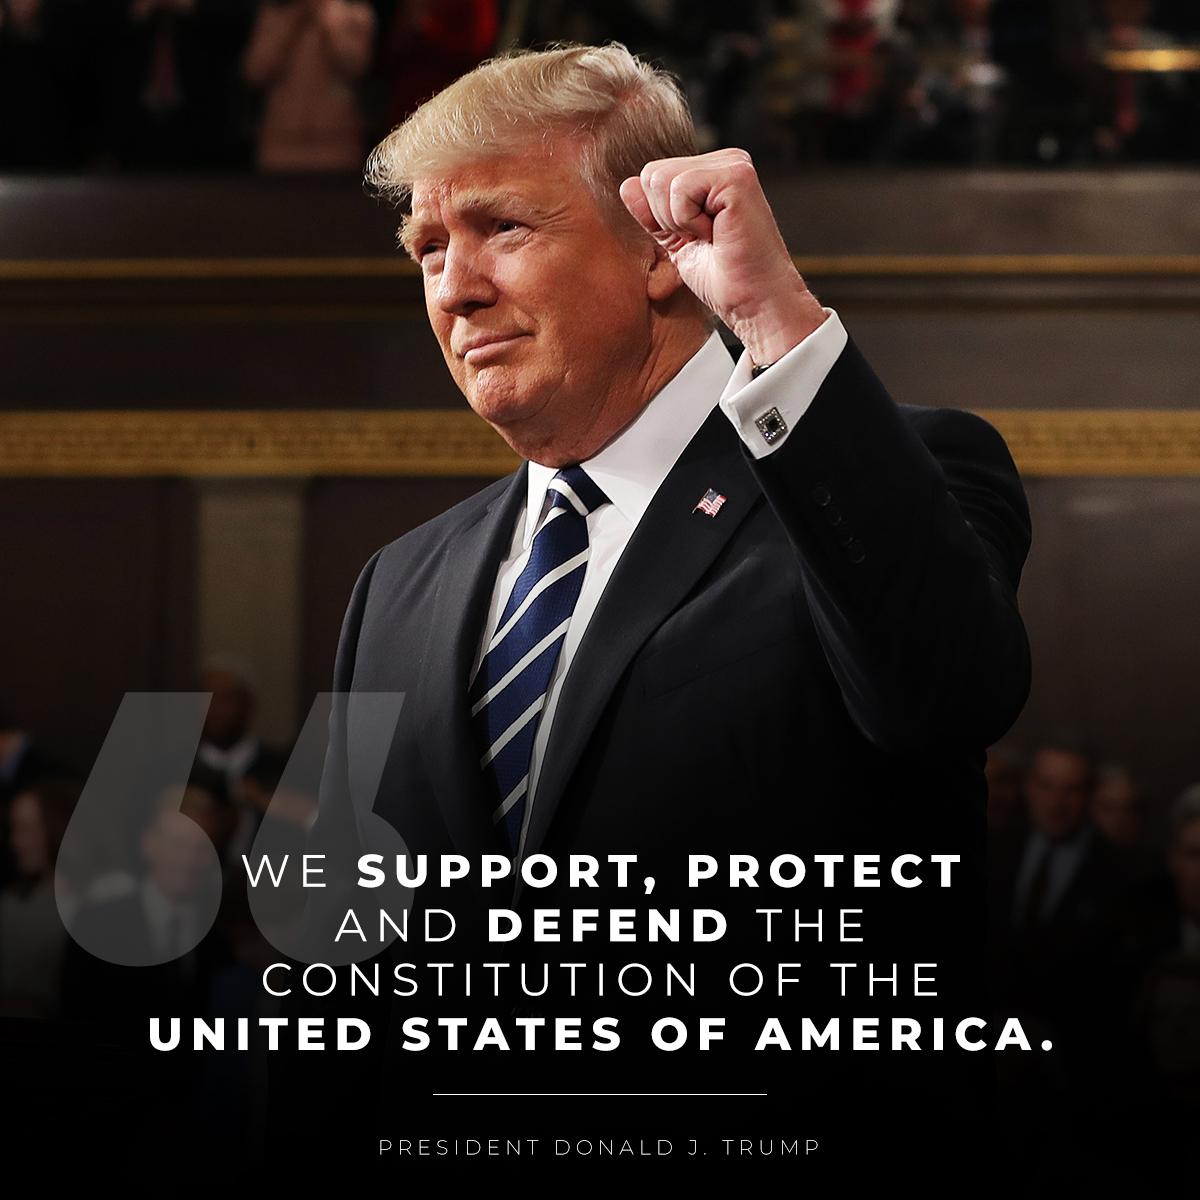 THANK YOU, @realDonaldTrump! #KAG